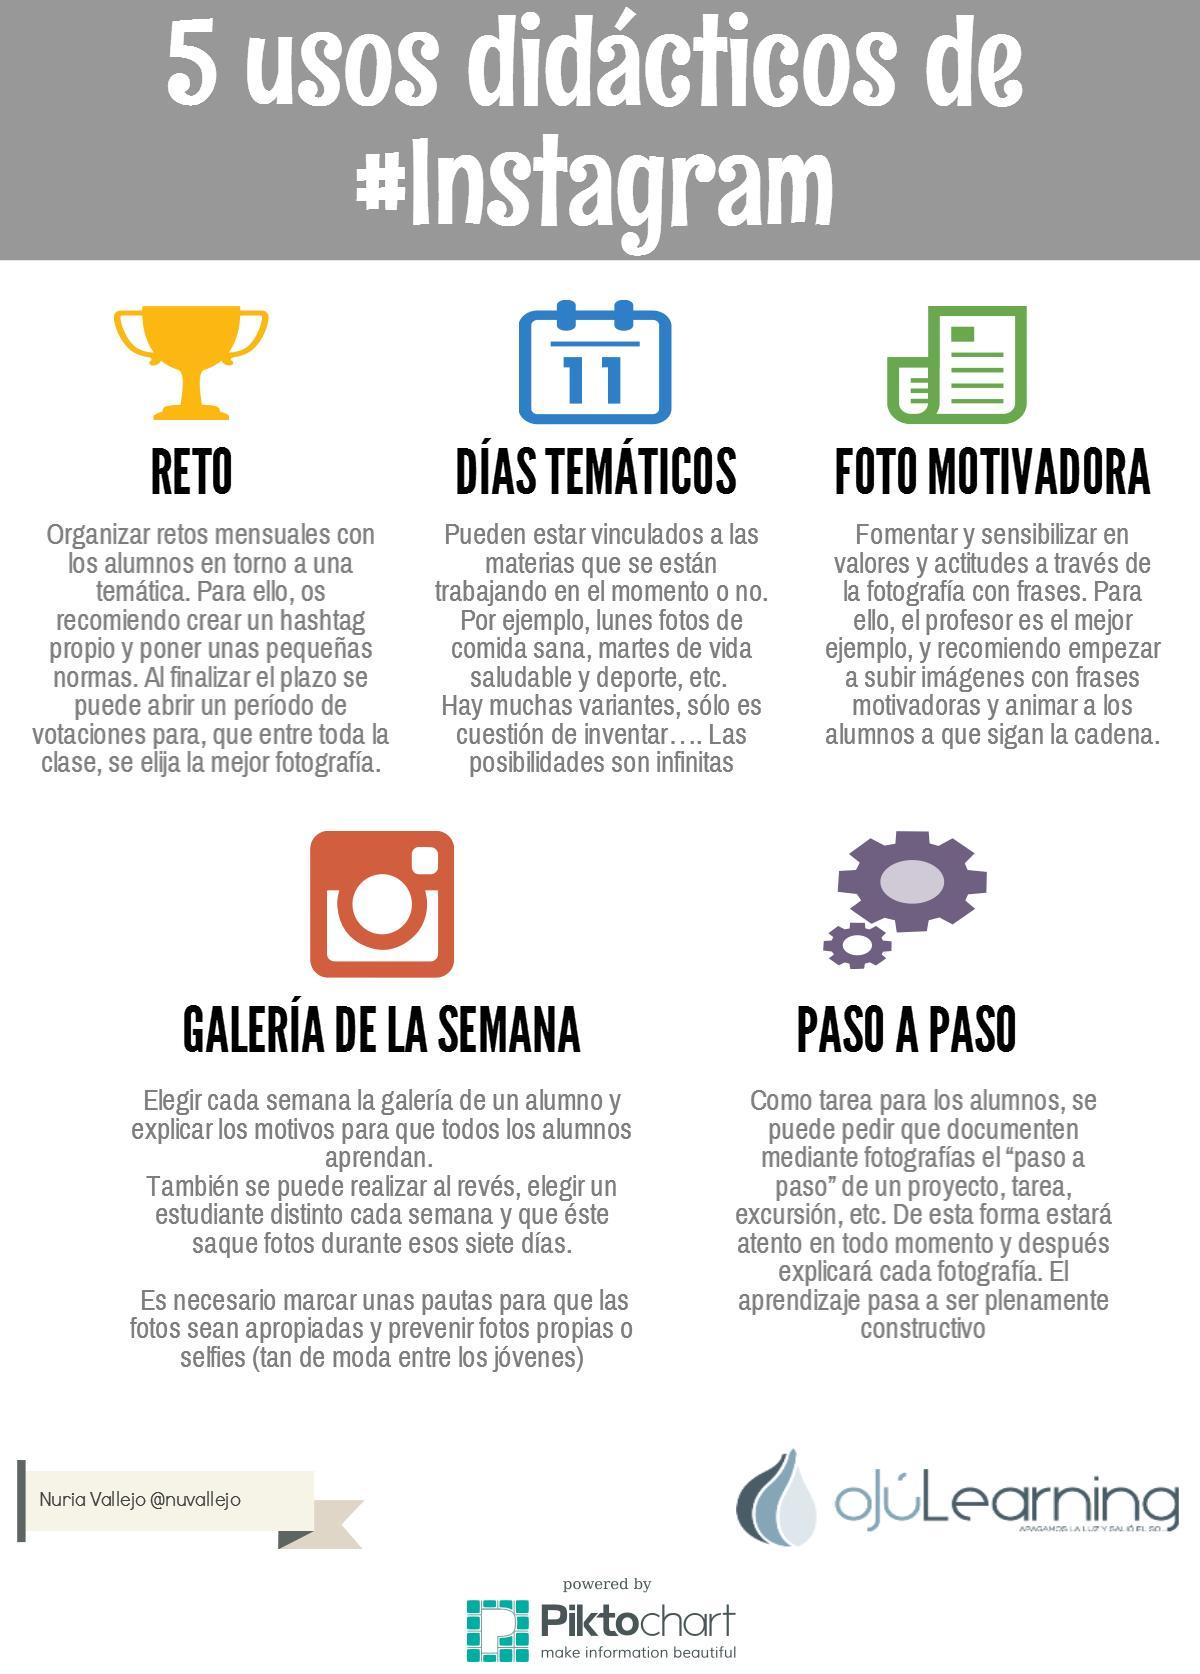 5 usos didácticos de Instagram #infografia #education #